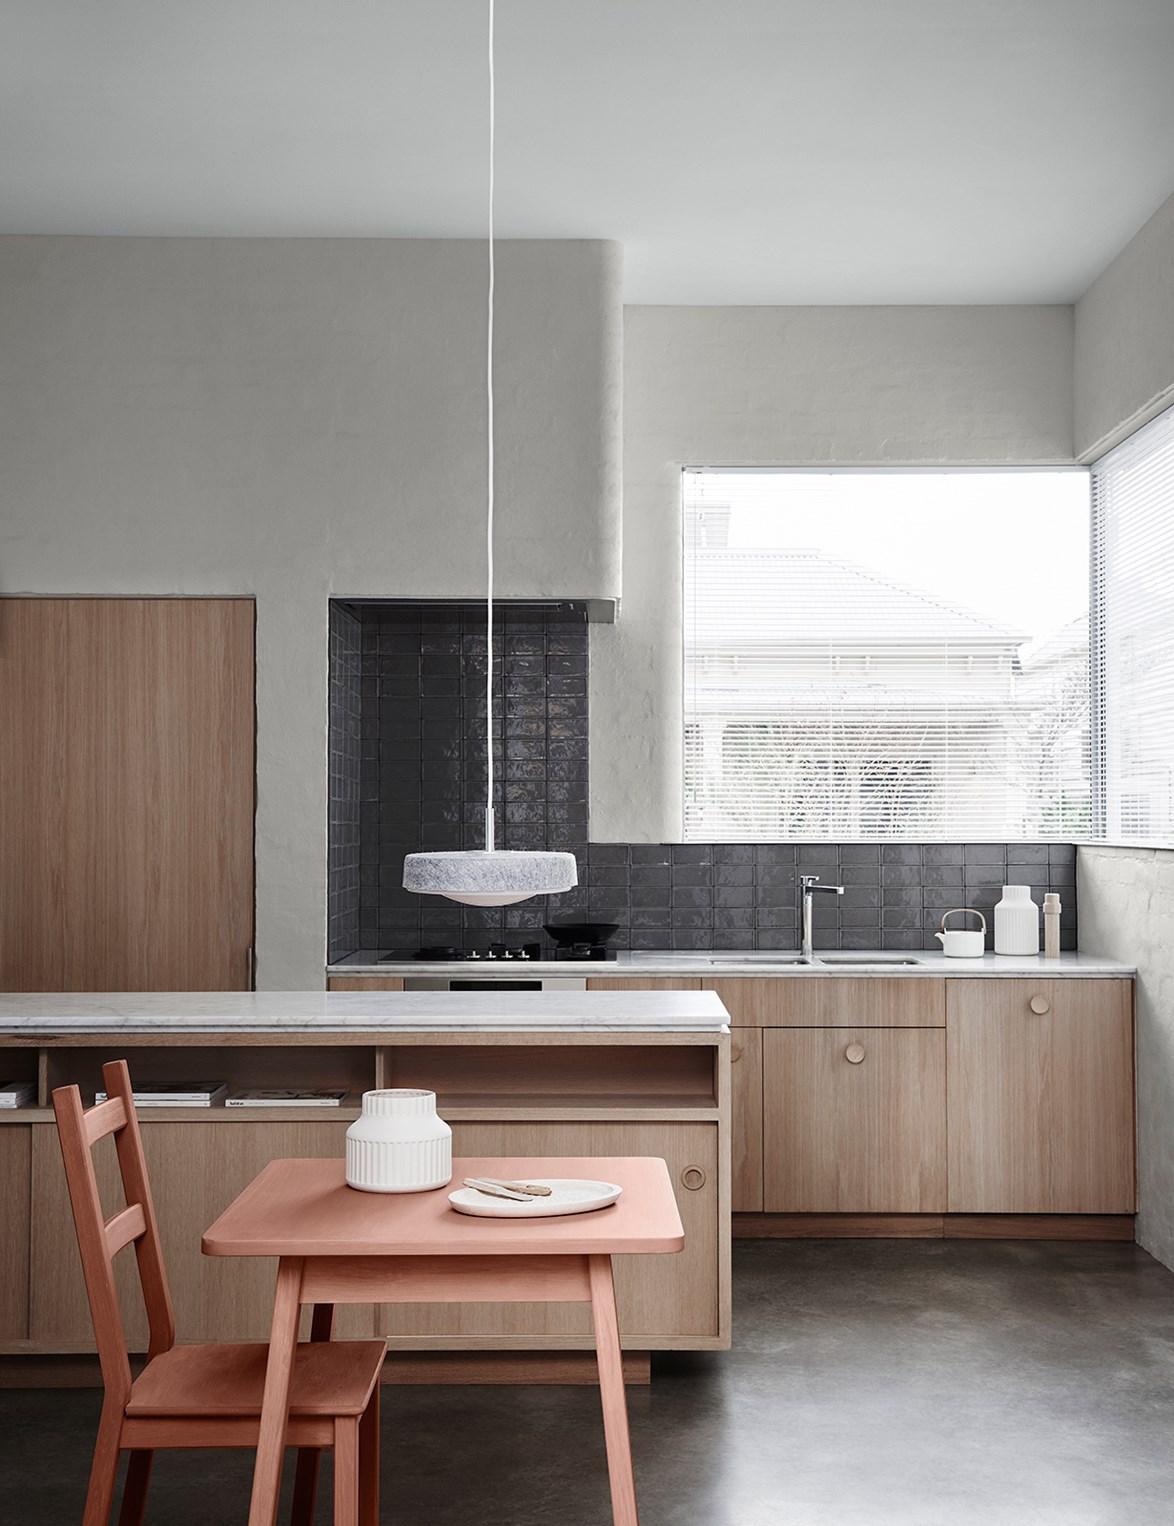 Dulux Colour Trends 2018 – Wall: Dulux Dieskau | Table & Chairs: Dulux Clay Court | Ceiling: Dulux Terrace White. Photo: Lisa Cohen | Styling: Bree Leech